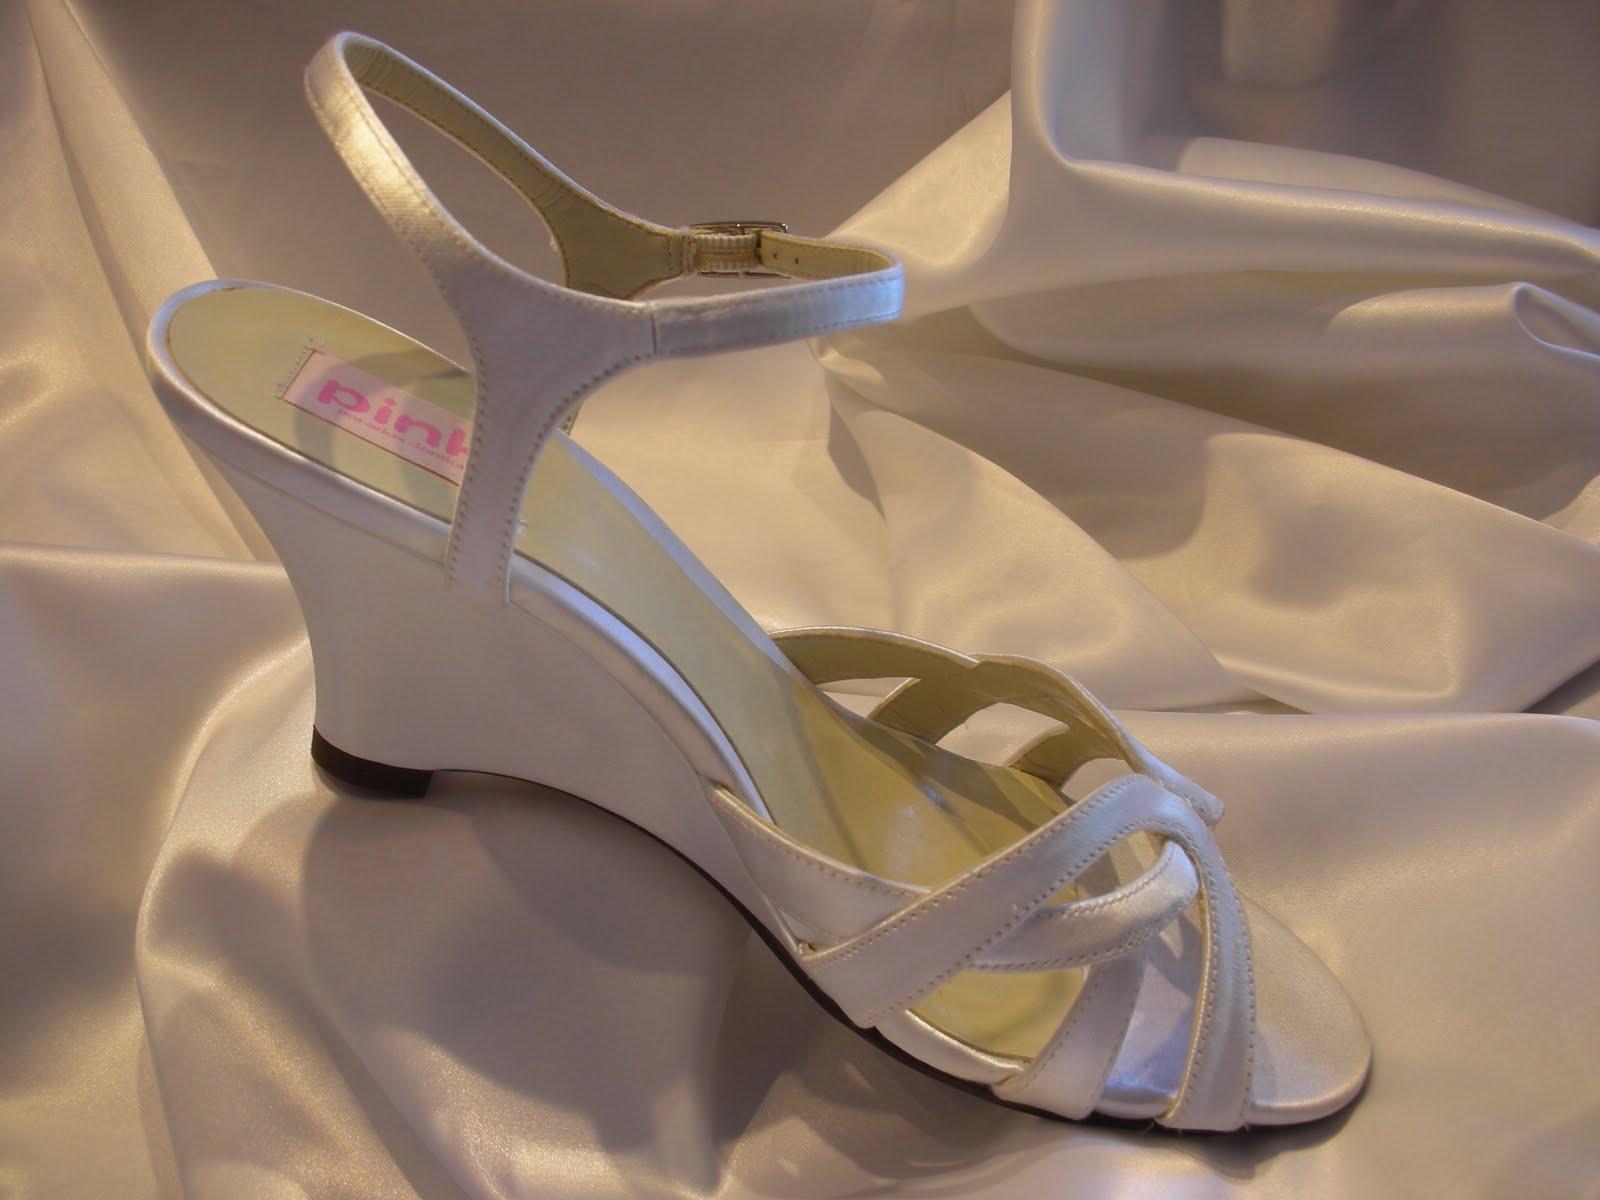 shoes for beach weddings beach wedding shoes Shoes for Beach Weddings